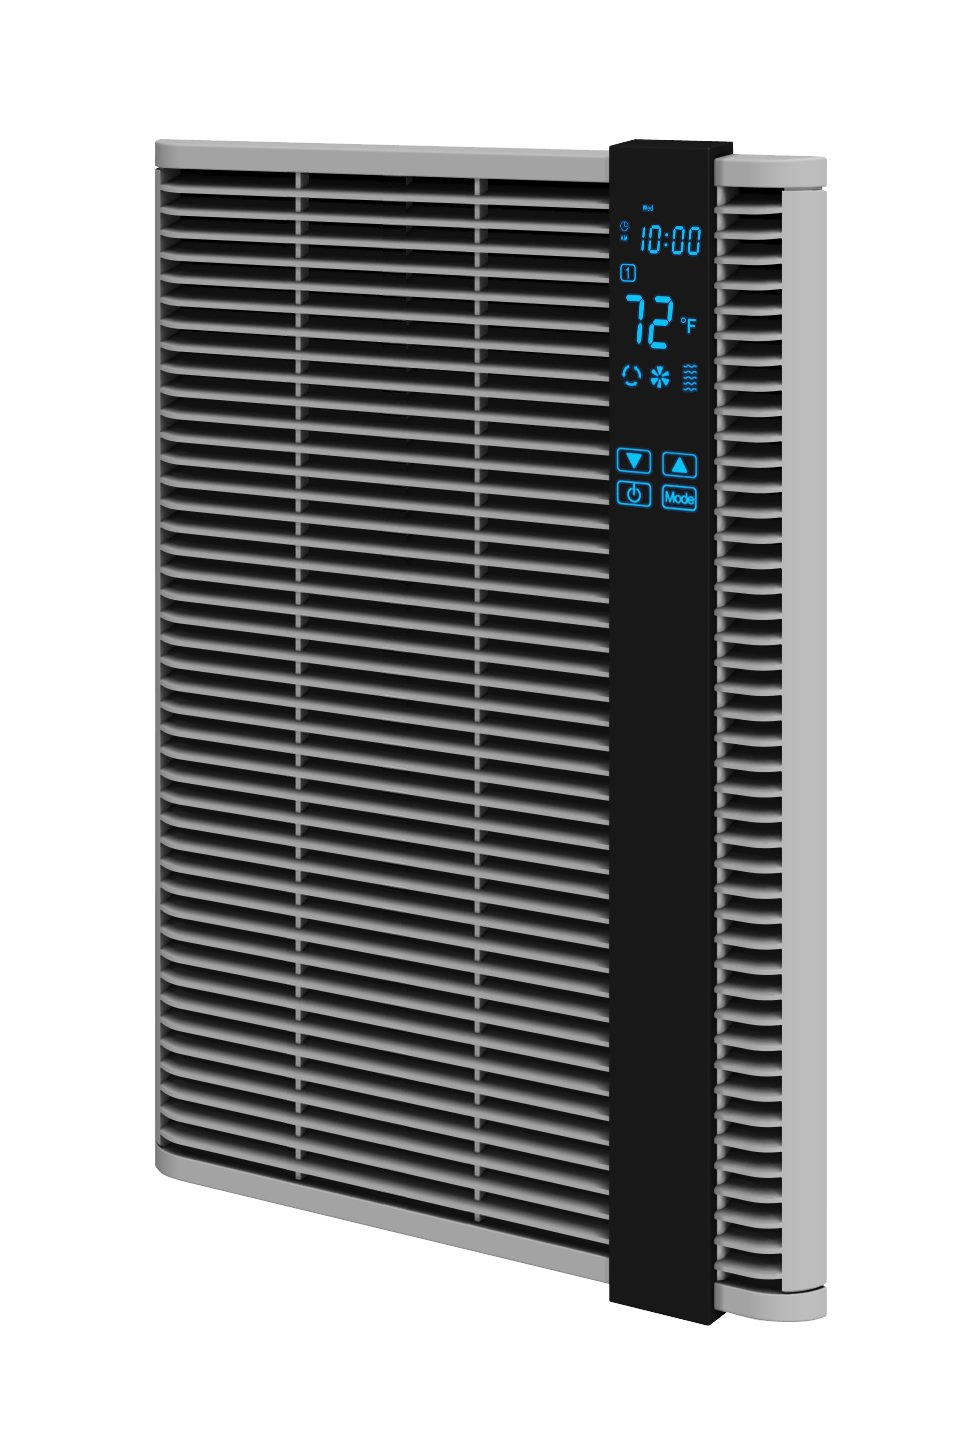 Fahrenheat FSSWH2004 Low Output Smart Series Forced Air Heater, 240-volt